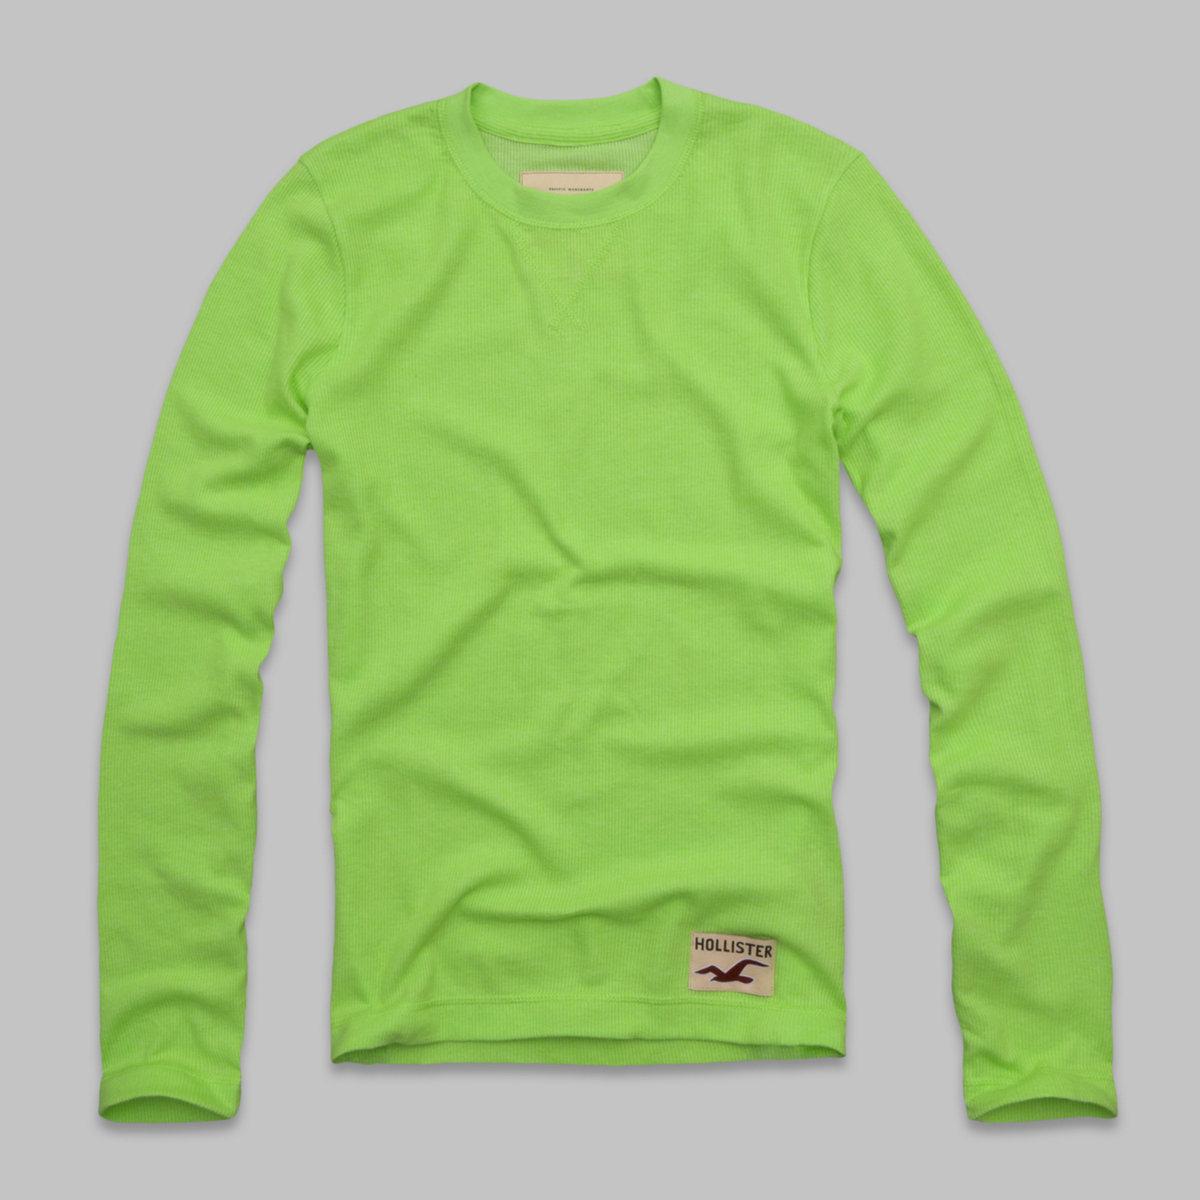 Fletcher Cove T-Shirt